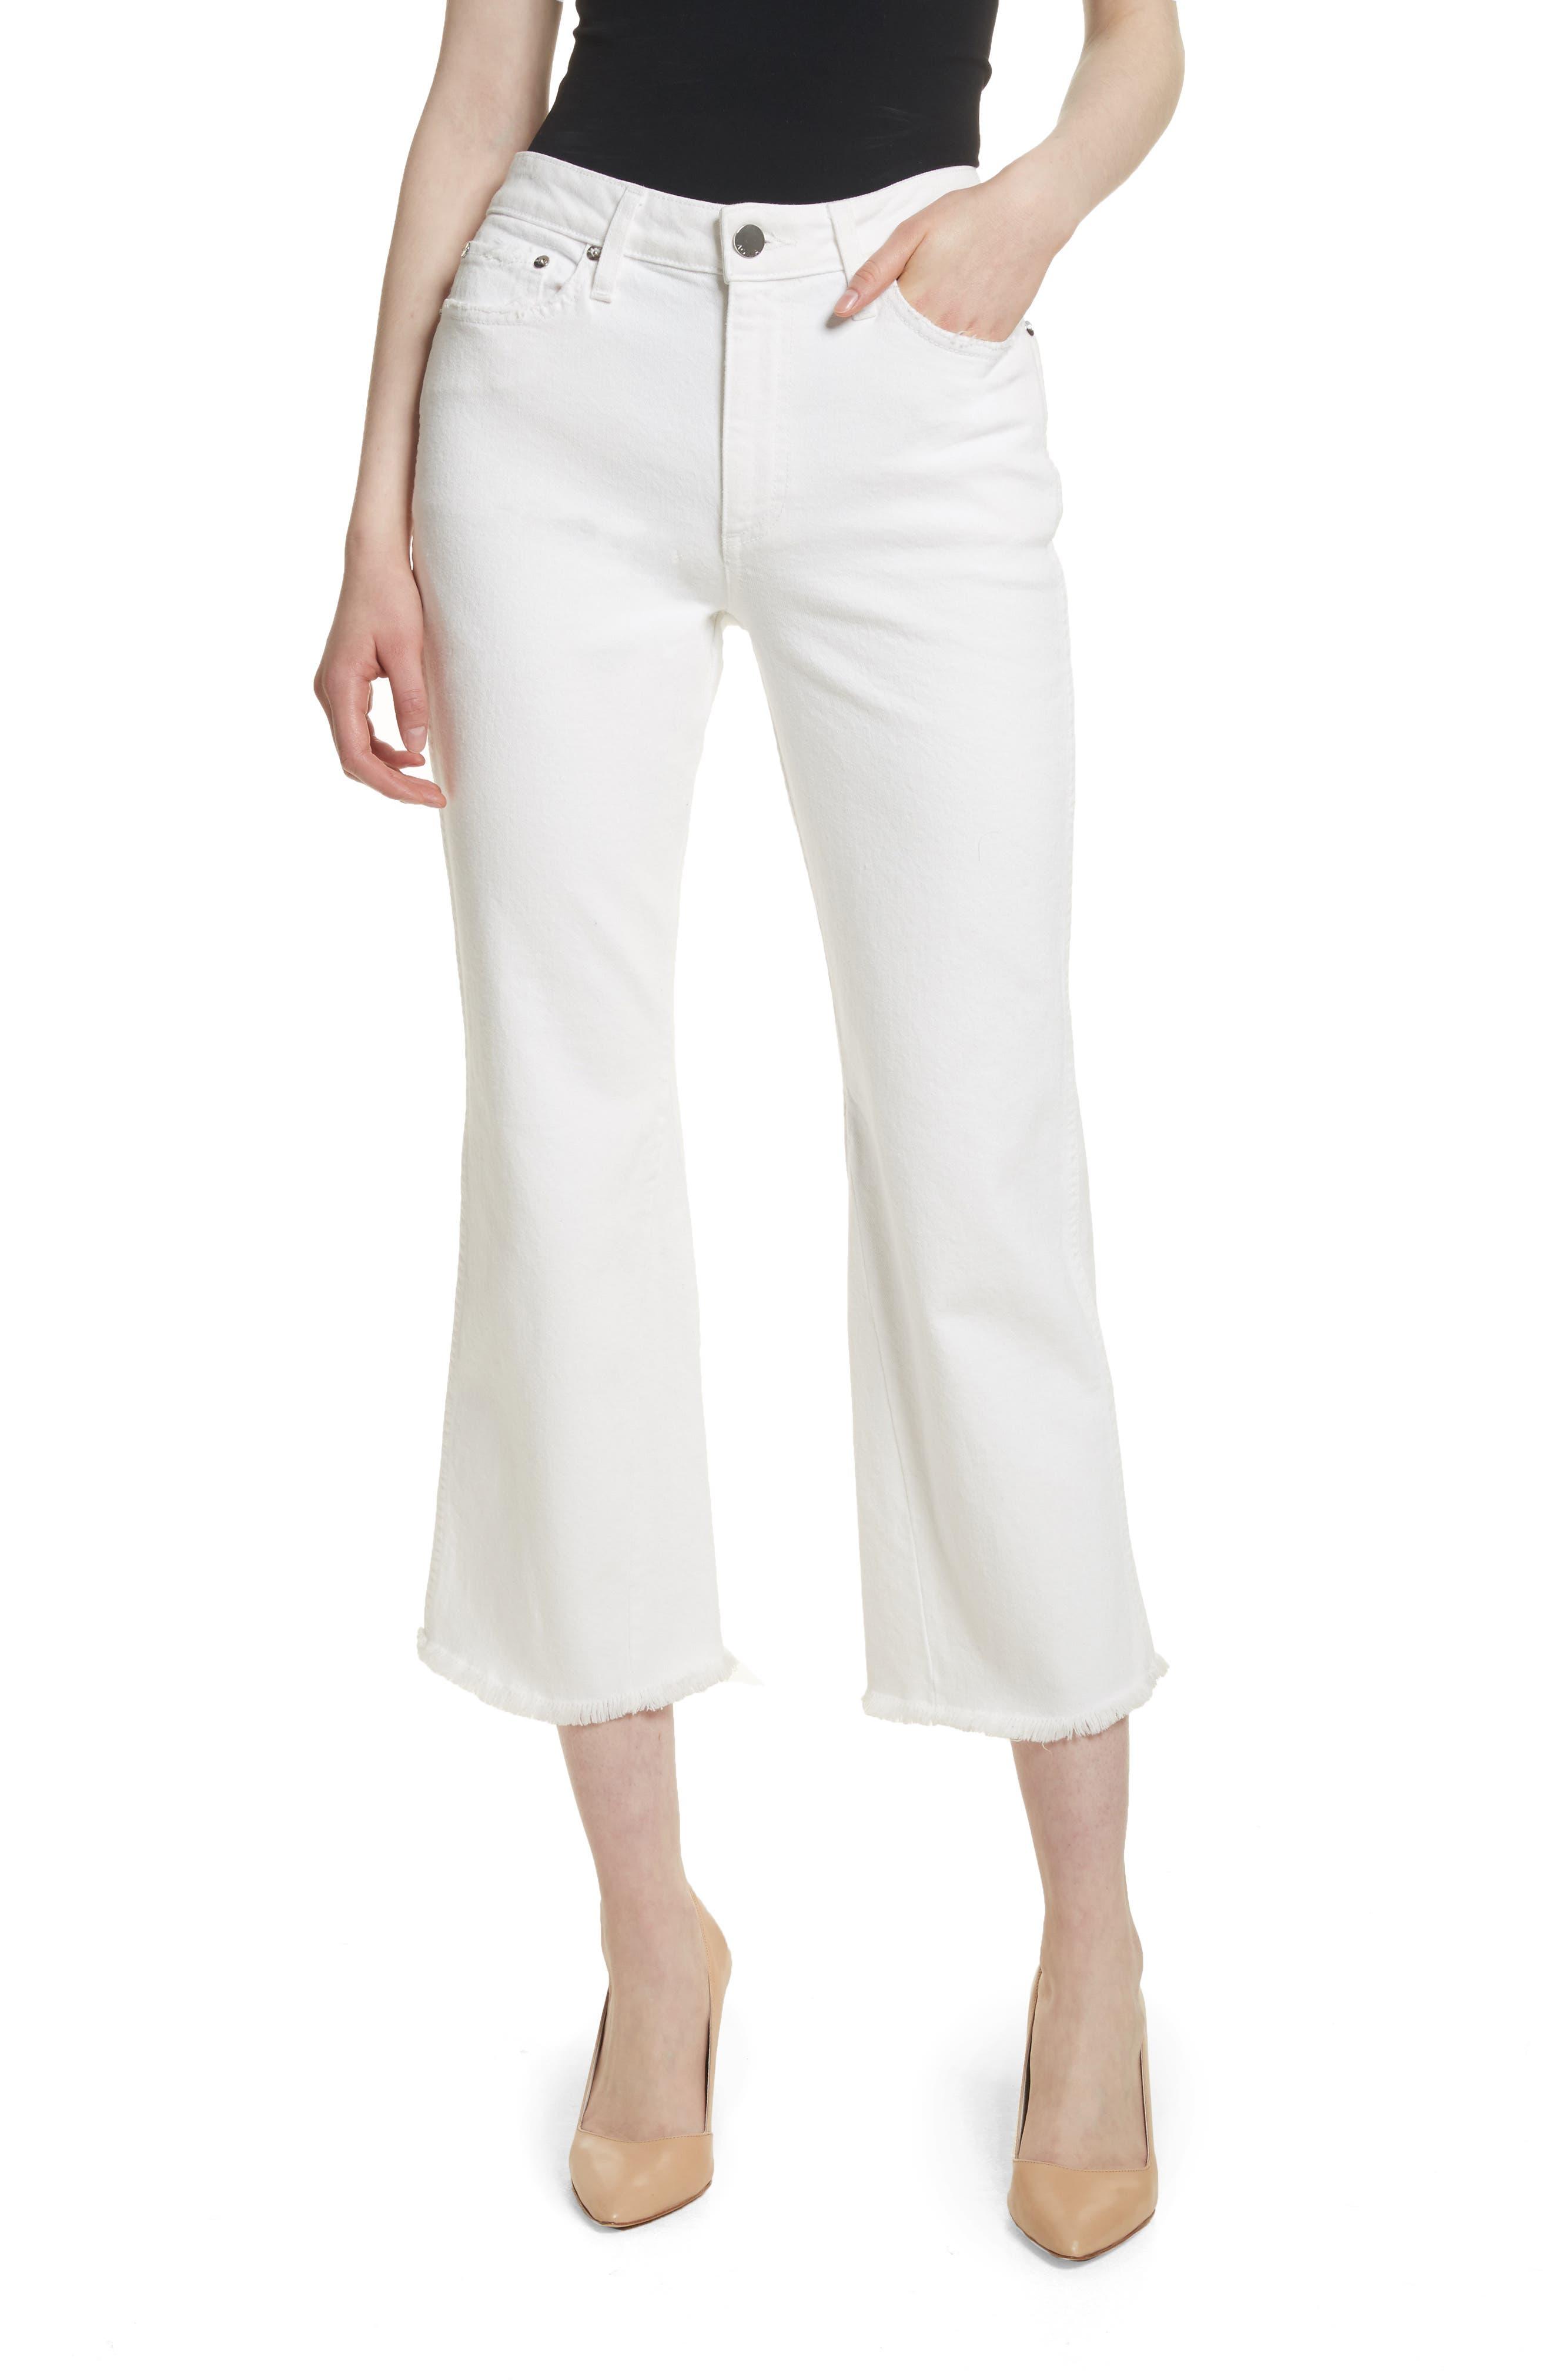 AO.LA Perfect Crop Kick Flare Jeans,                         Main,                         color, 160